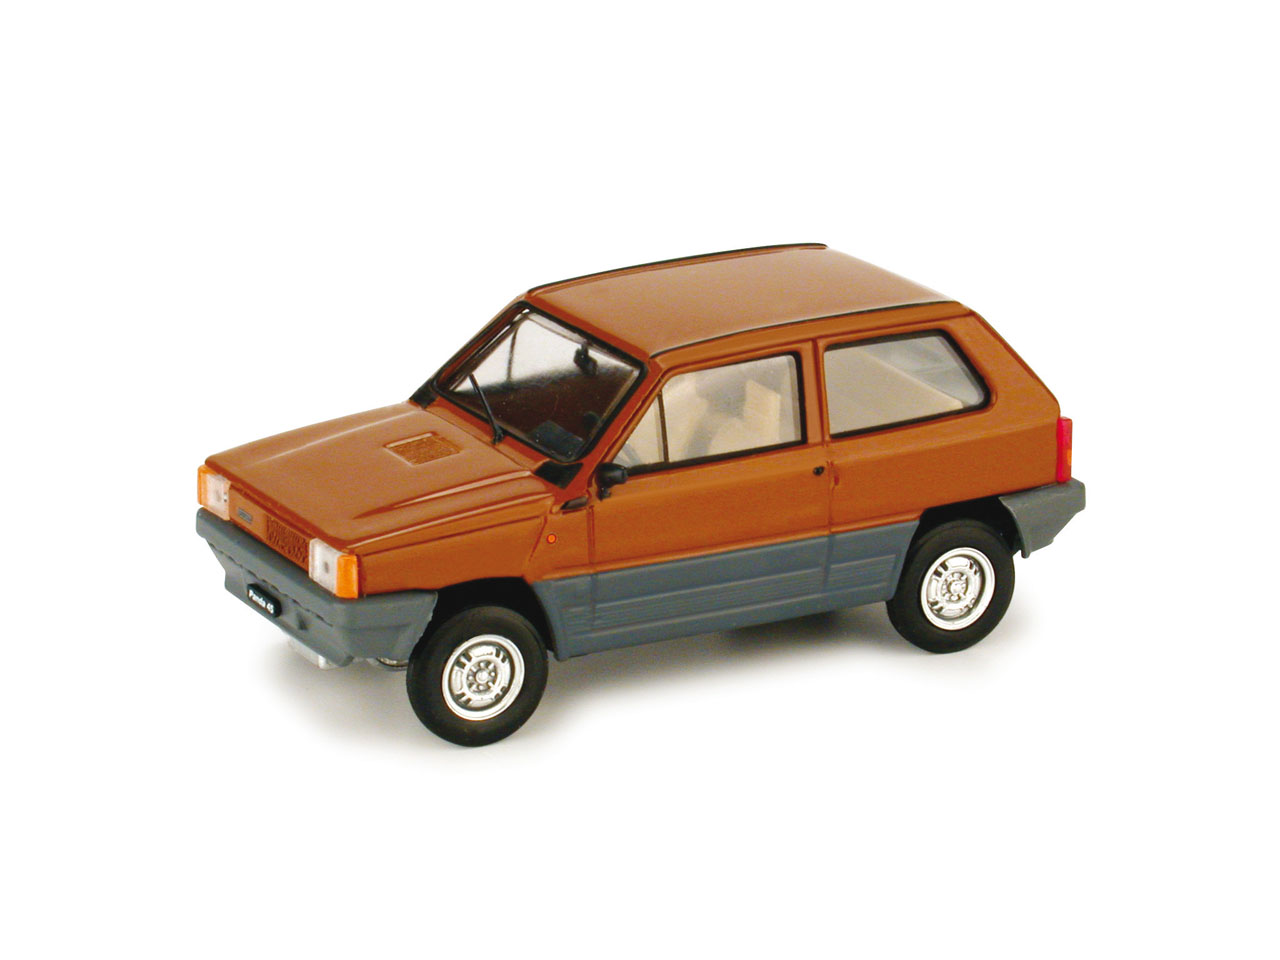 Fiat Panda 45 (1980) Brumm 1/43 Marrón Land